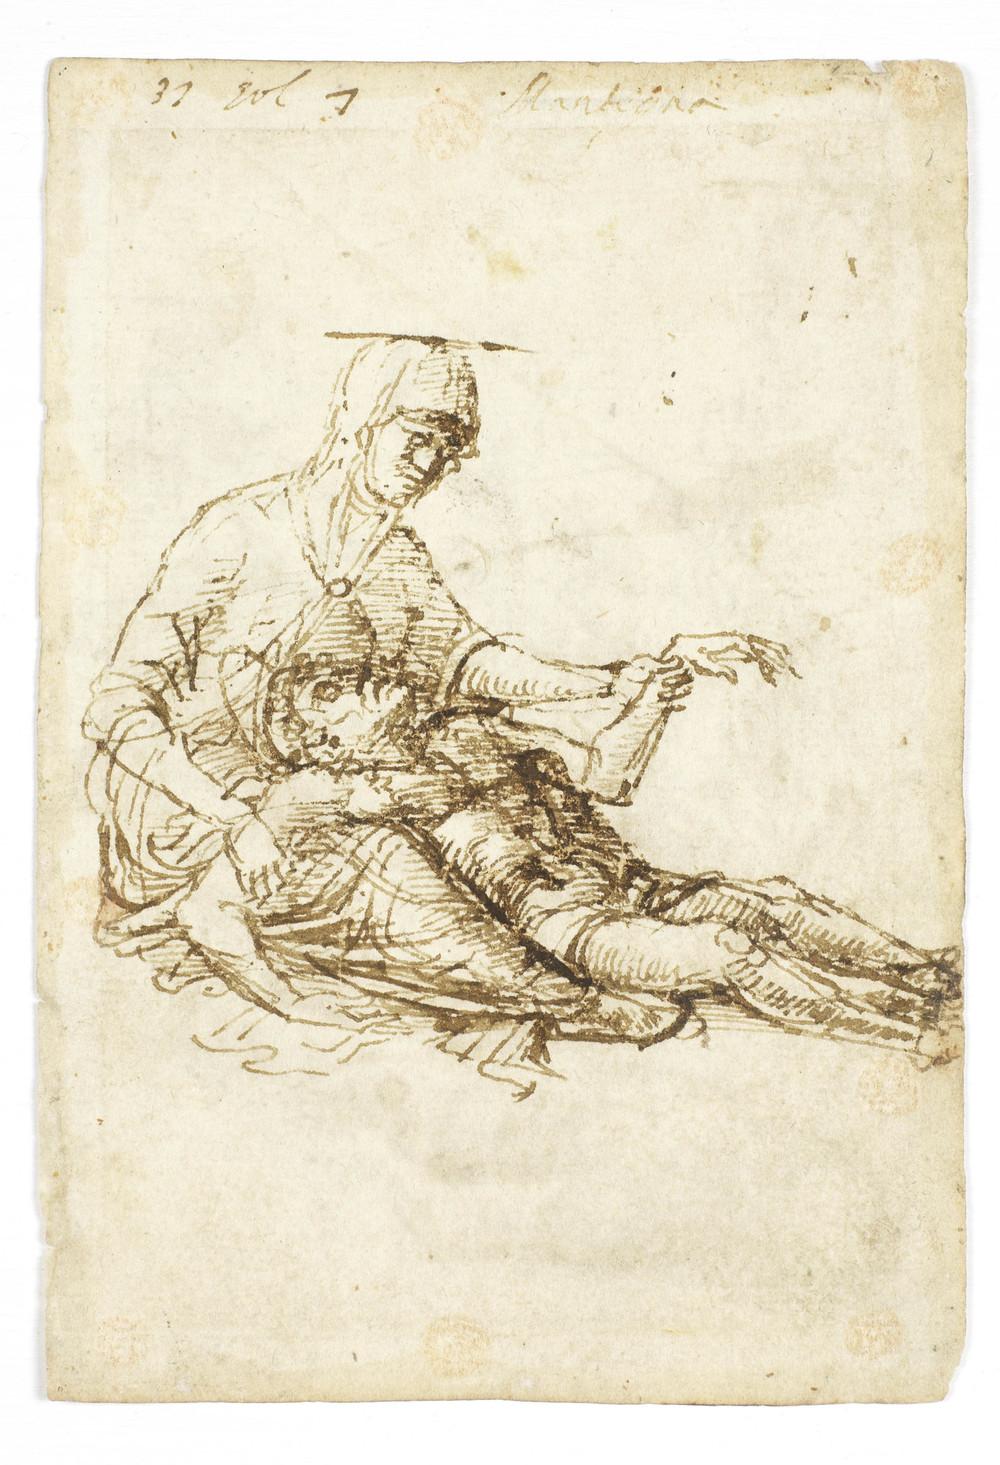 StudyforPieta,AndreaMantegna(ca1460, unpublished)